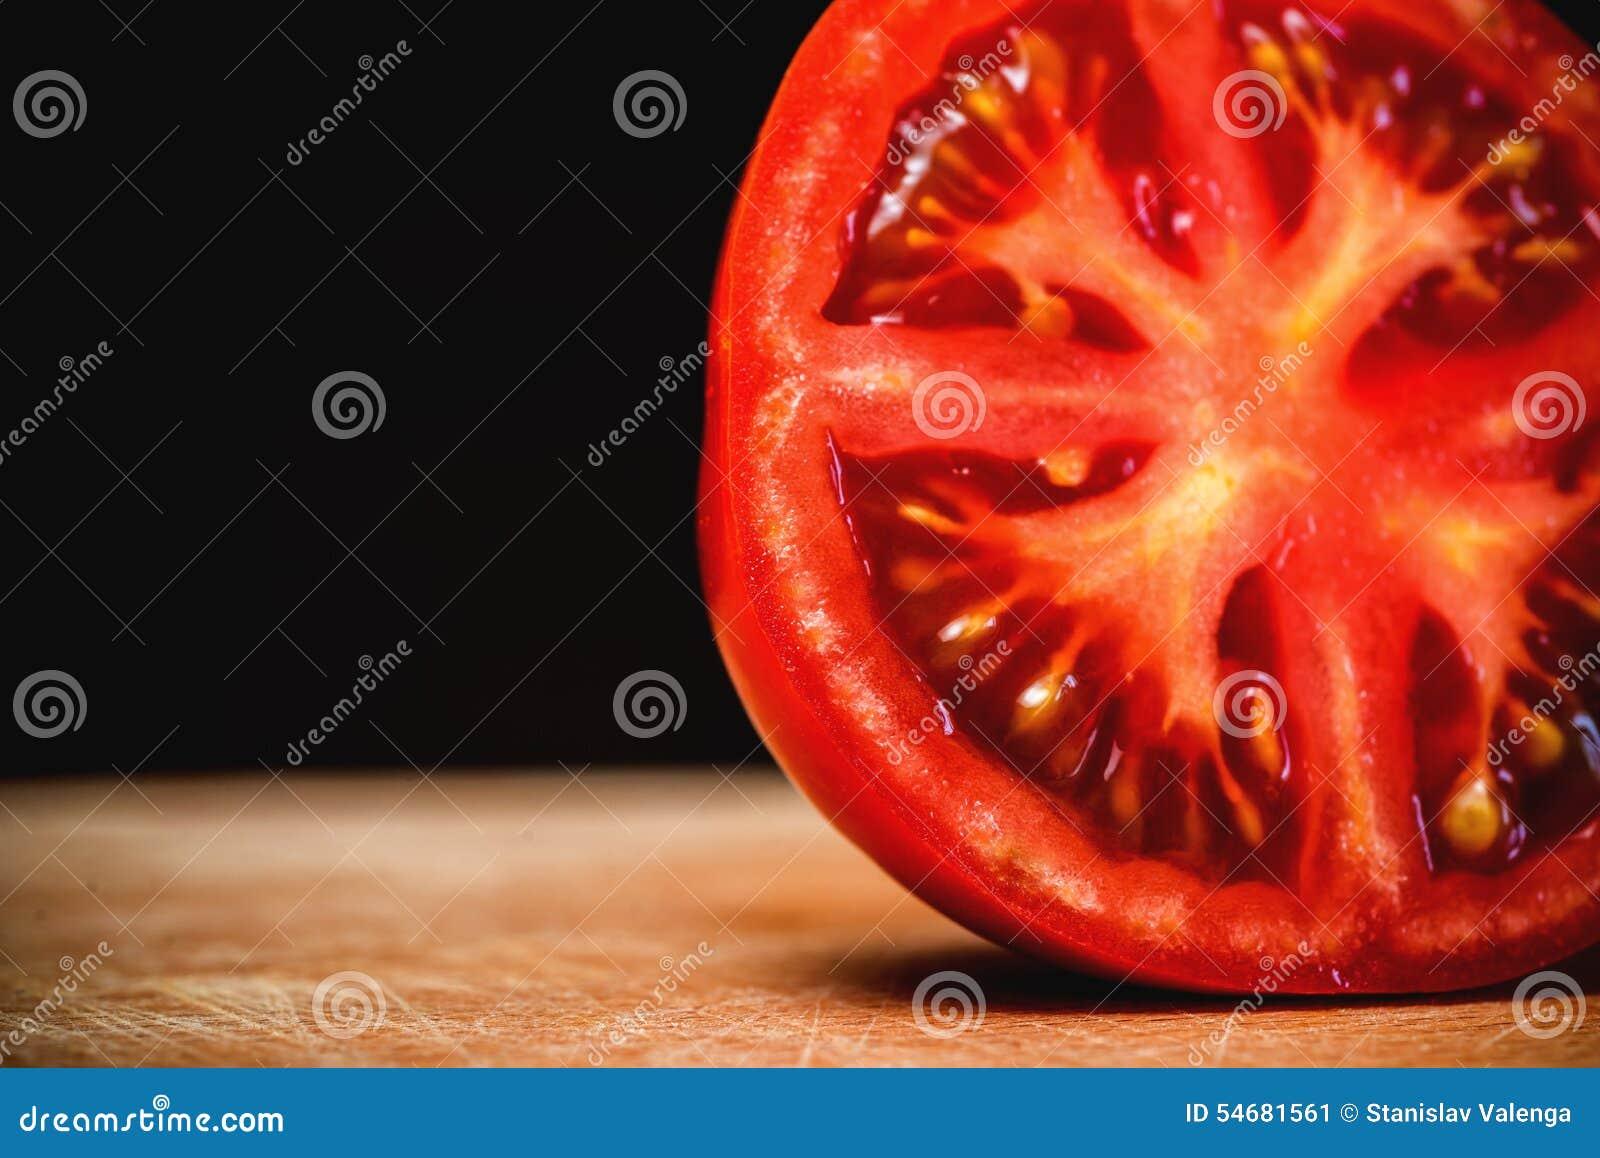 Half Cut Sliced of Fresh Tomato on Wood Table